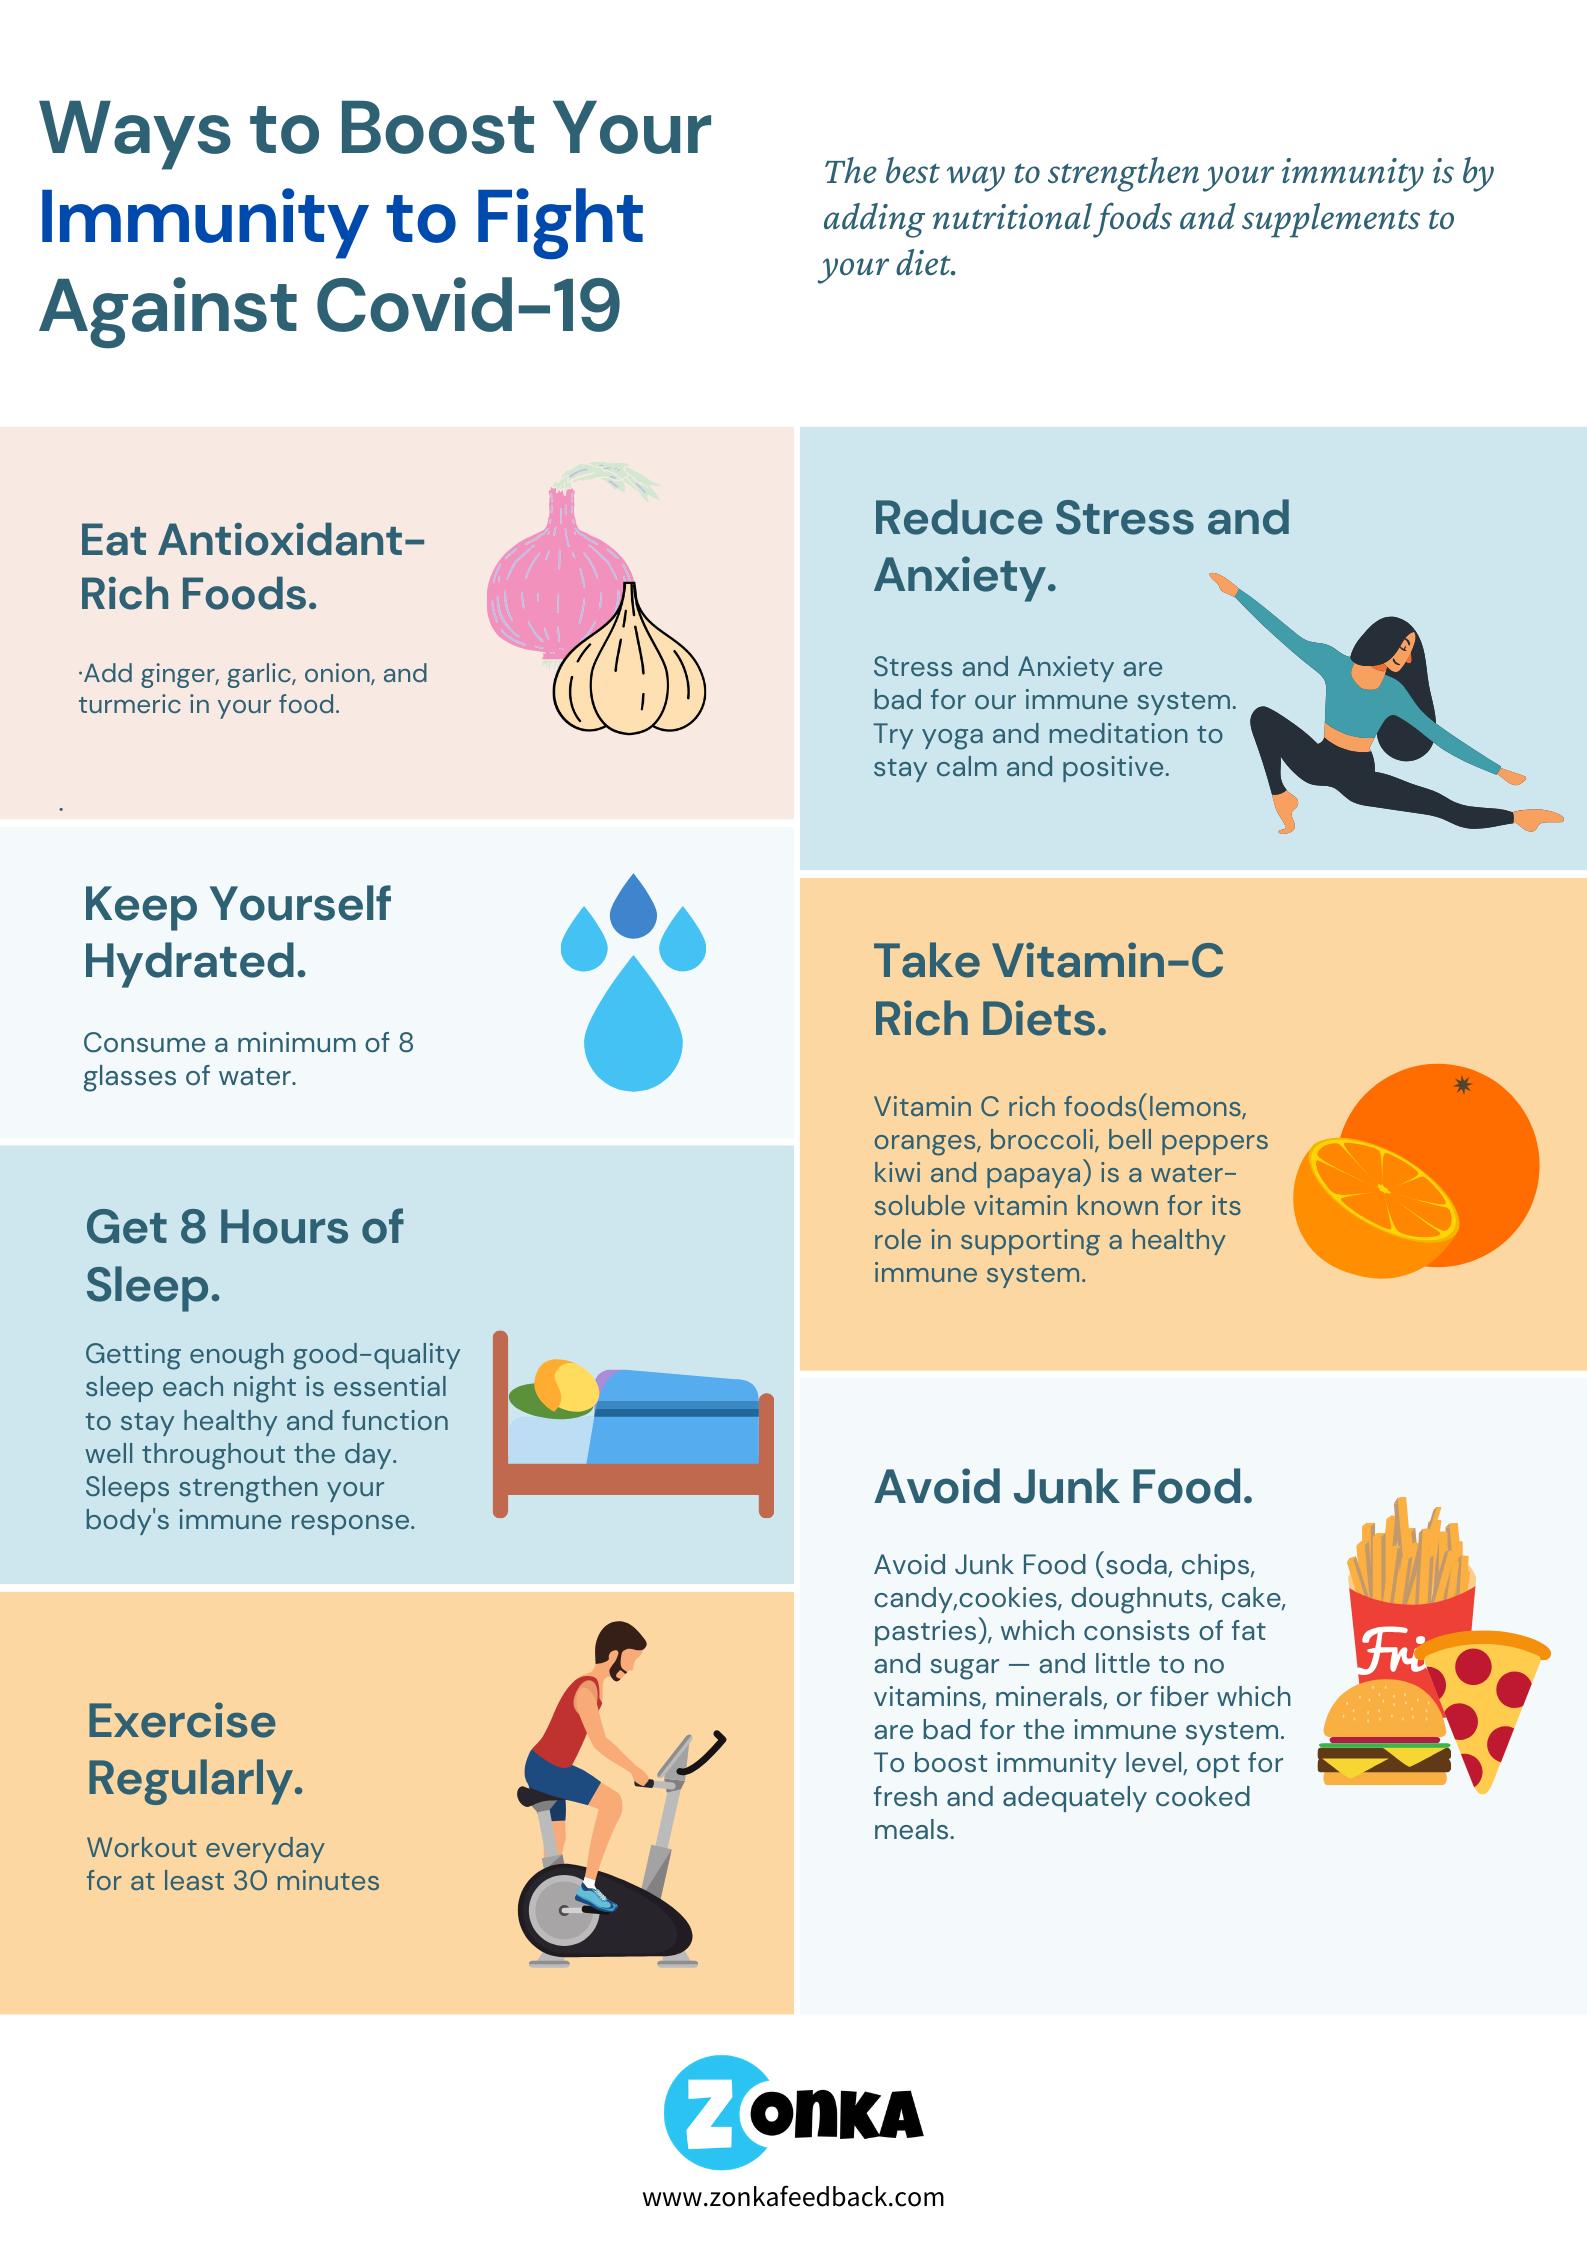 ways-to-improve-immunity